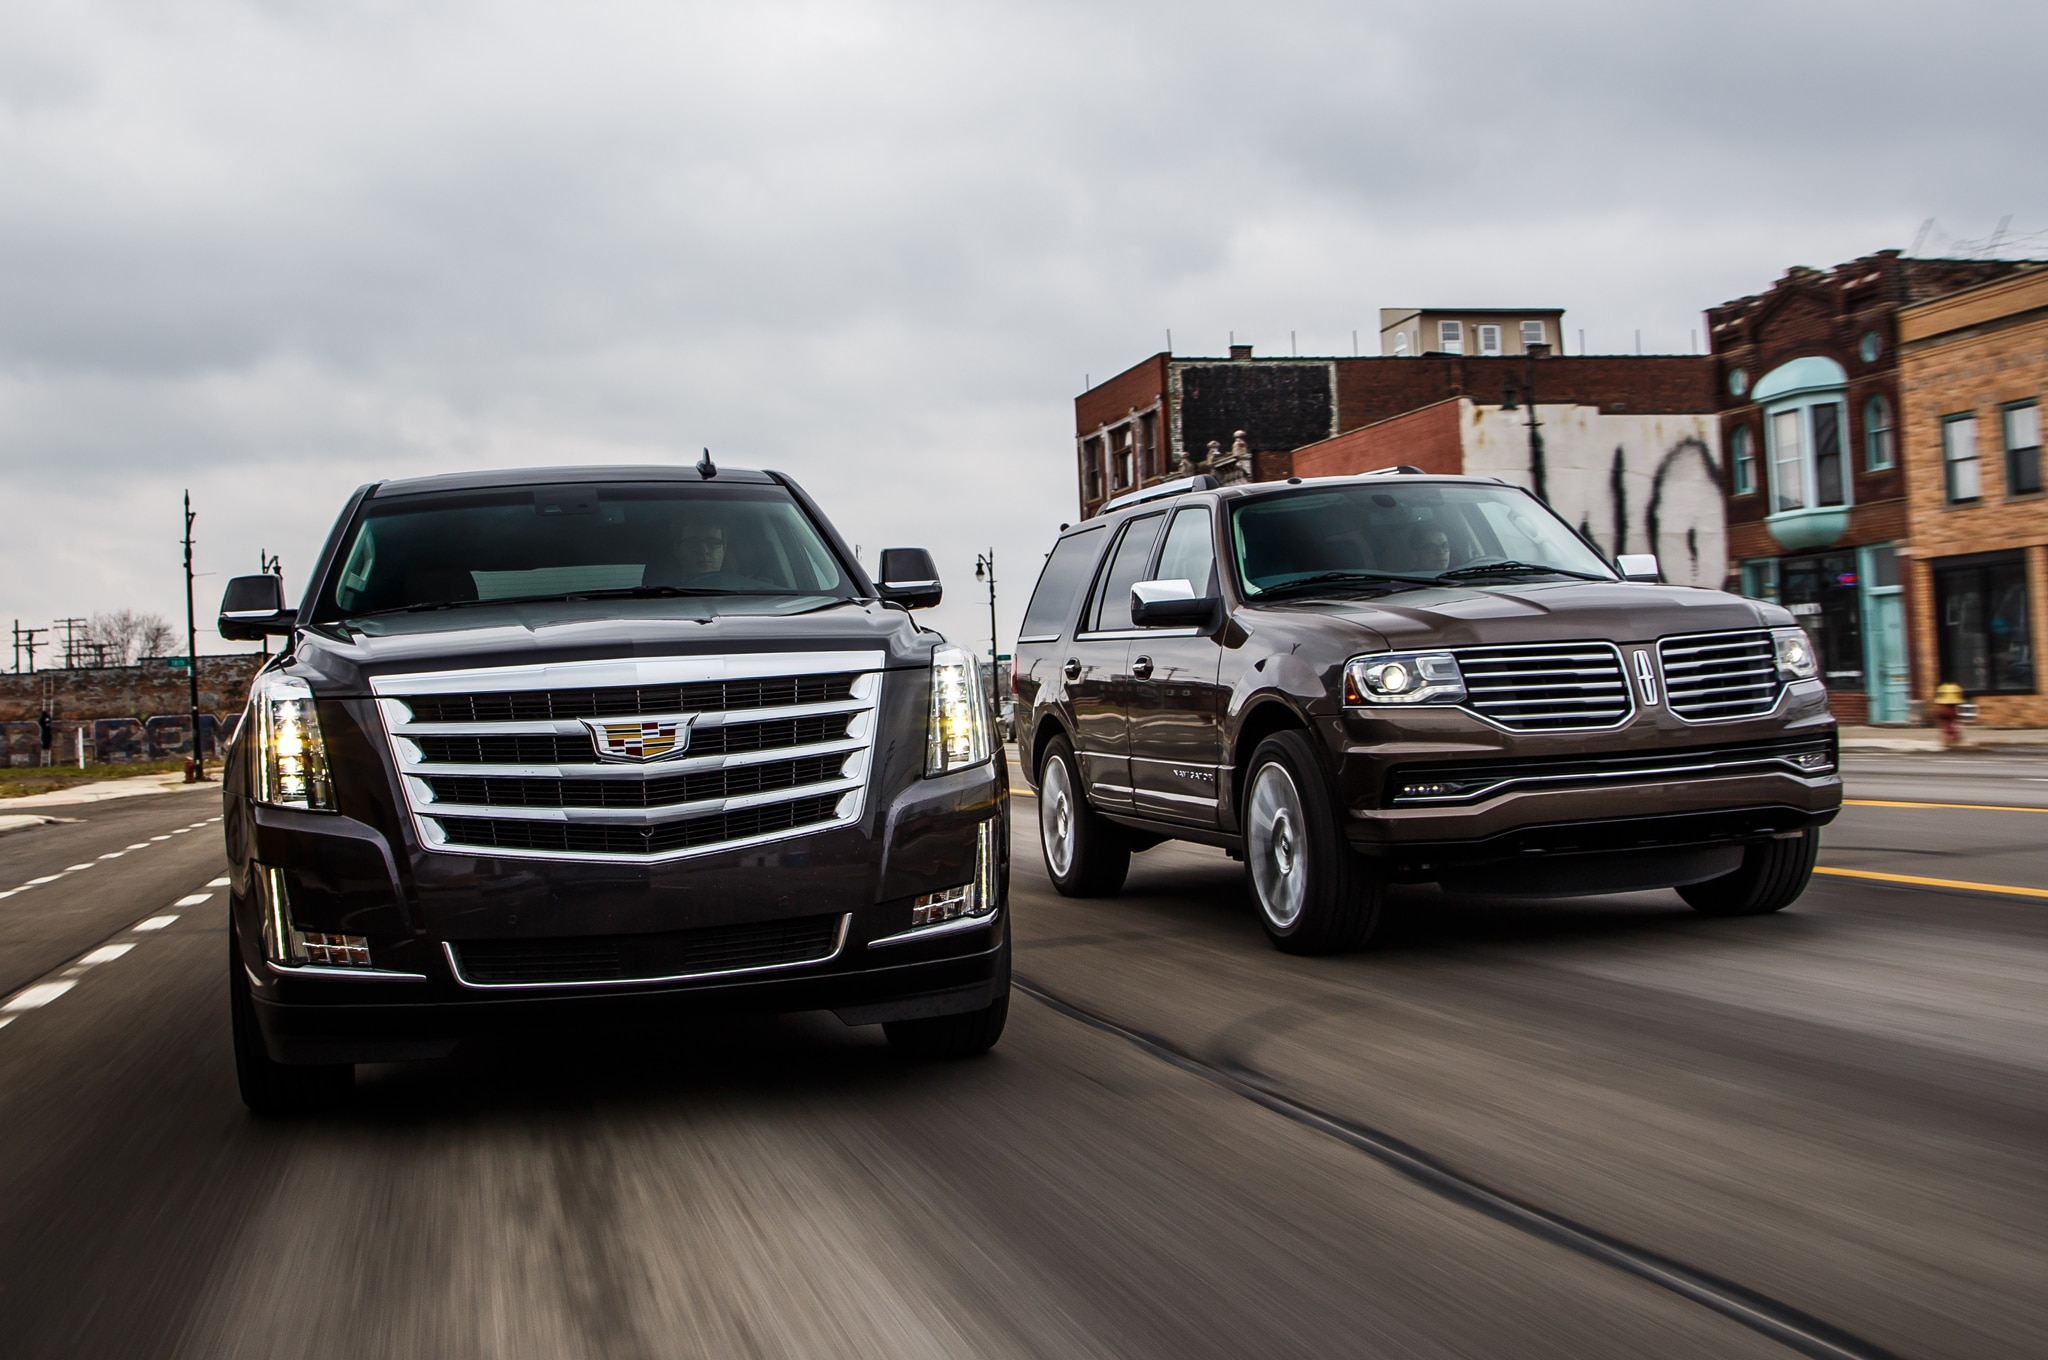 2015 Cadillac Escalade And 2015 Lincoln Navigator Moving Car To Car 1